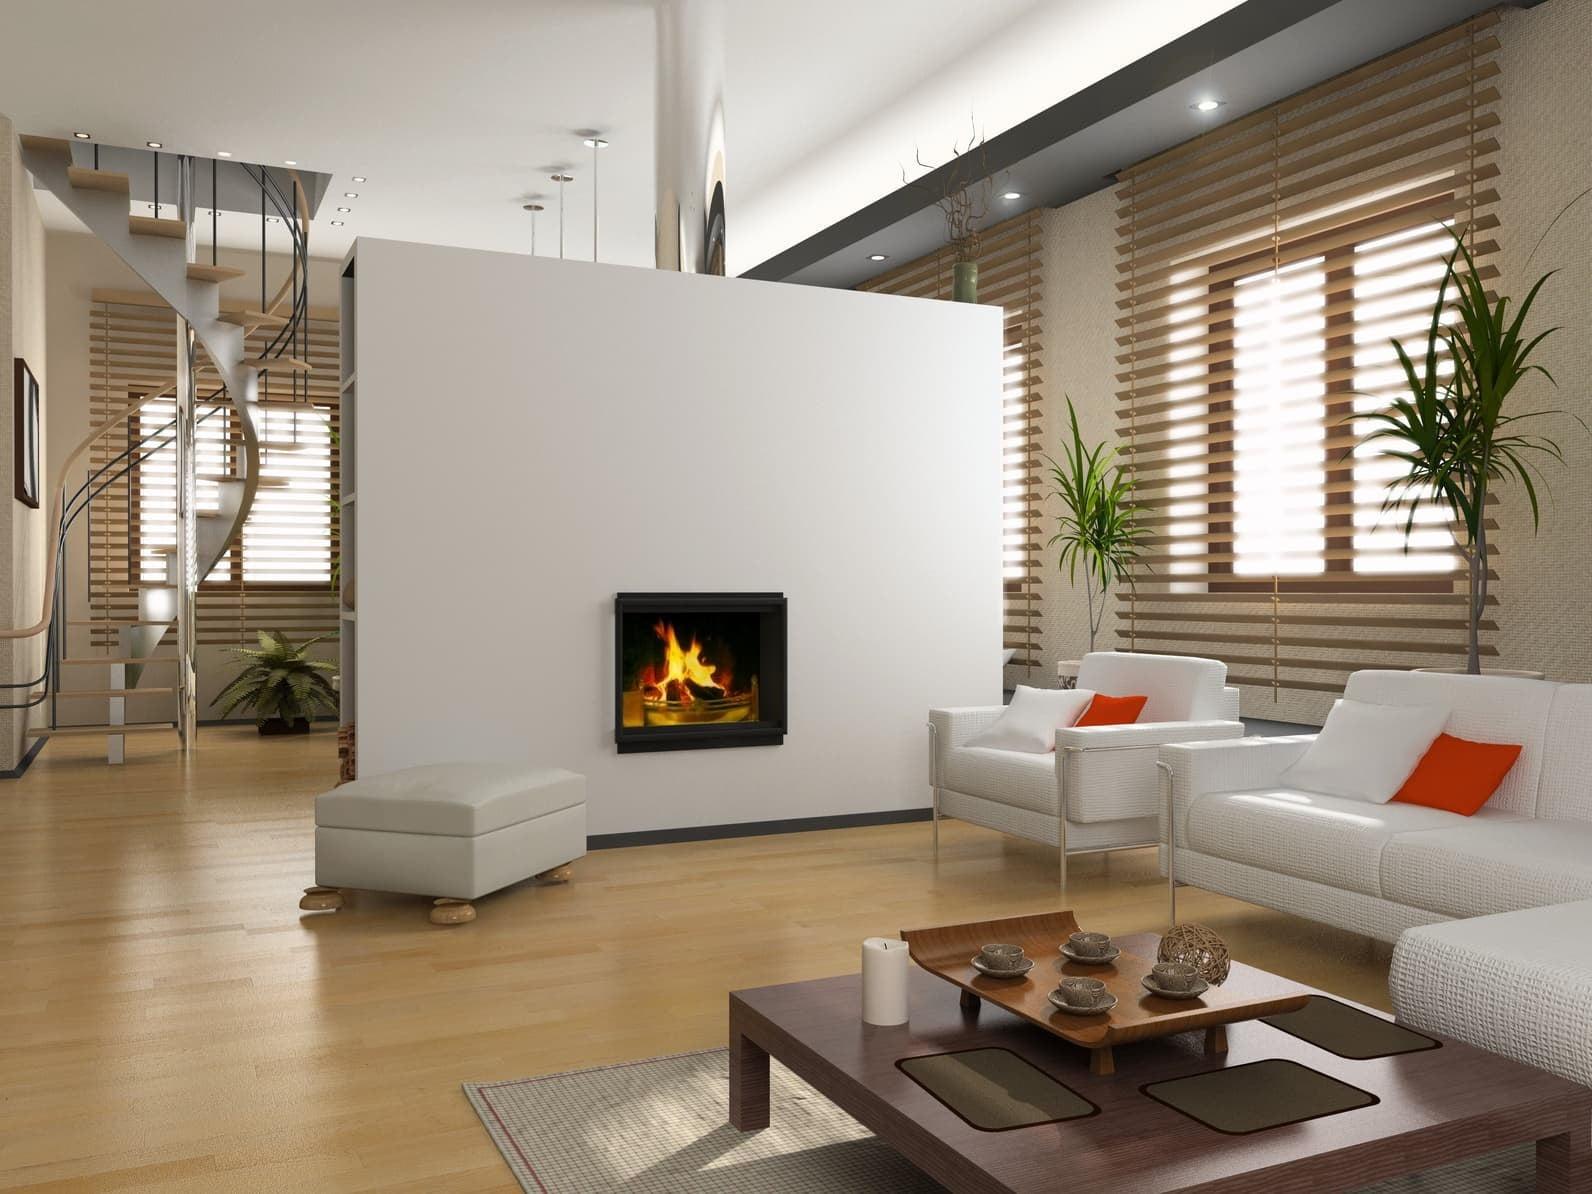 Bien-aimé Arredare casa: solo una scelta di stile? - Design Miss QL52